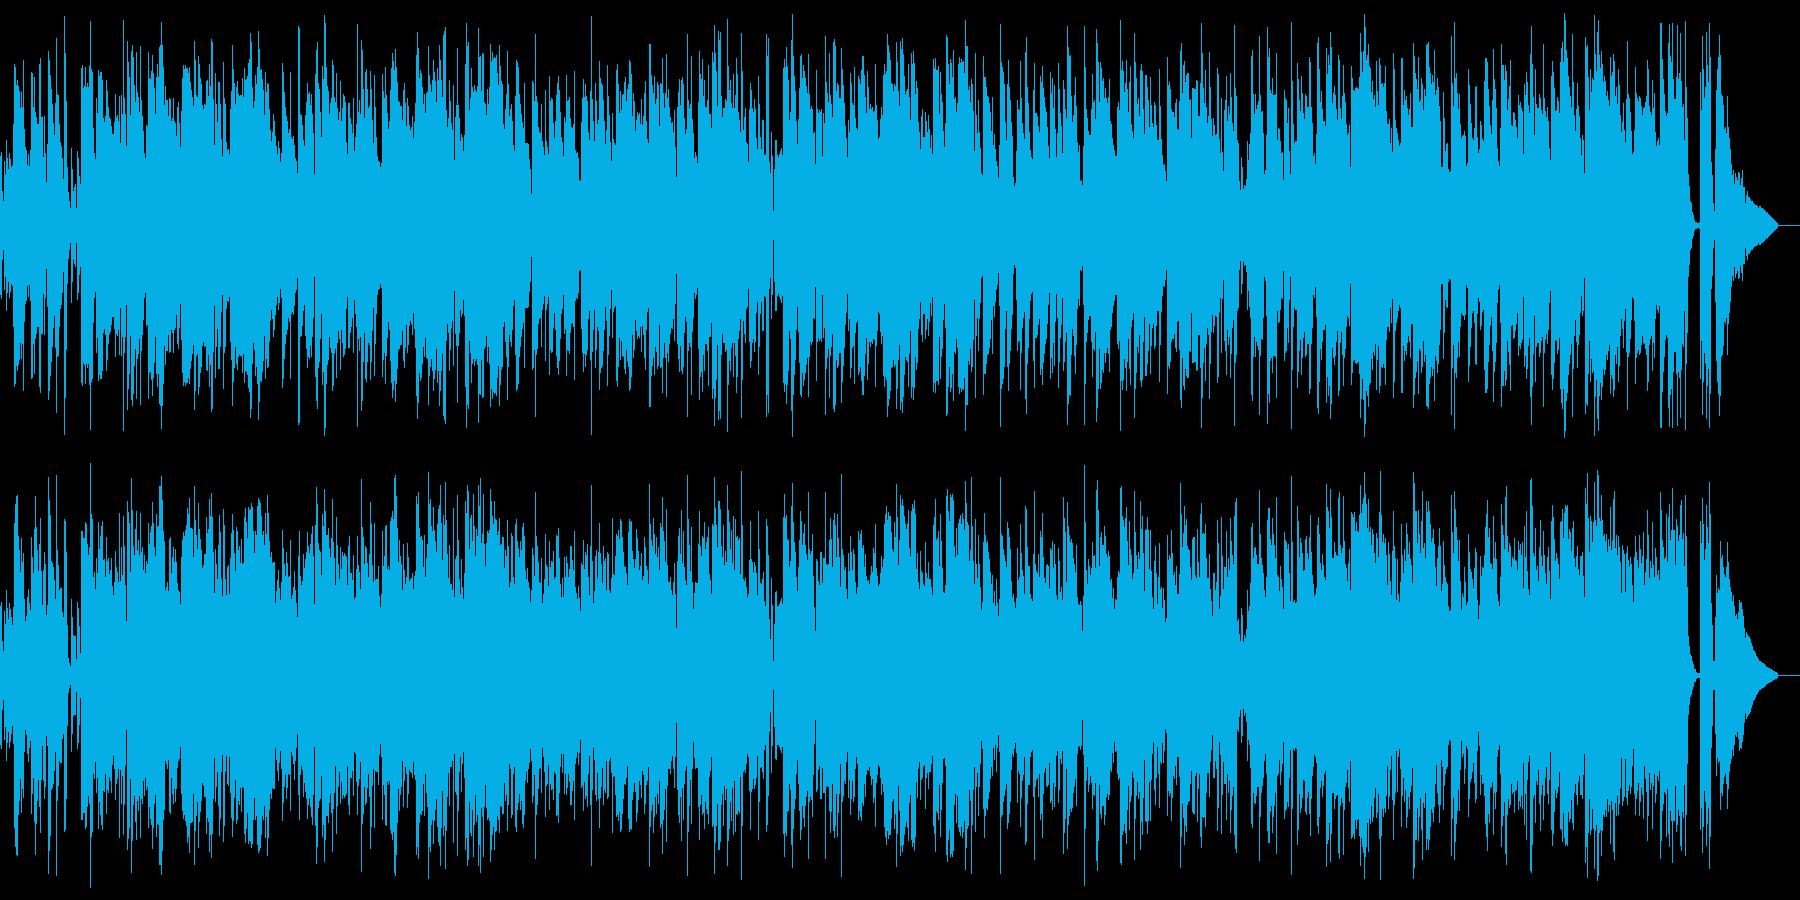 Hilo One(ハワイアン)の再生済みの波形